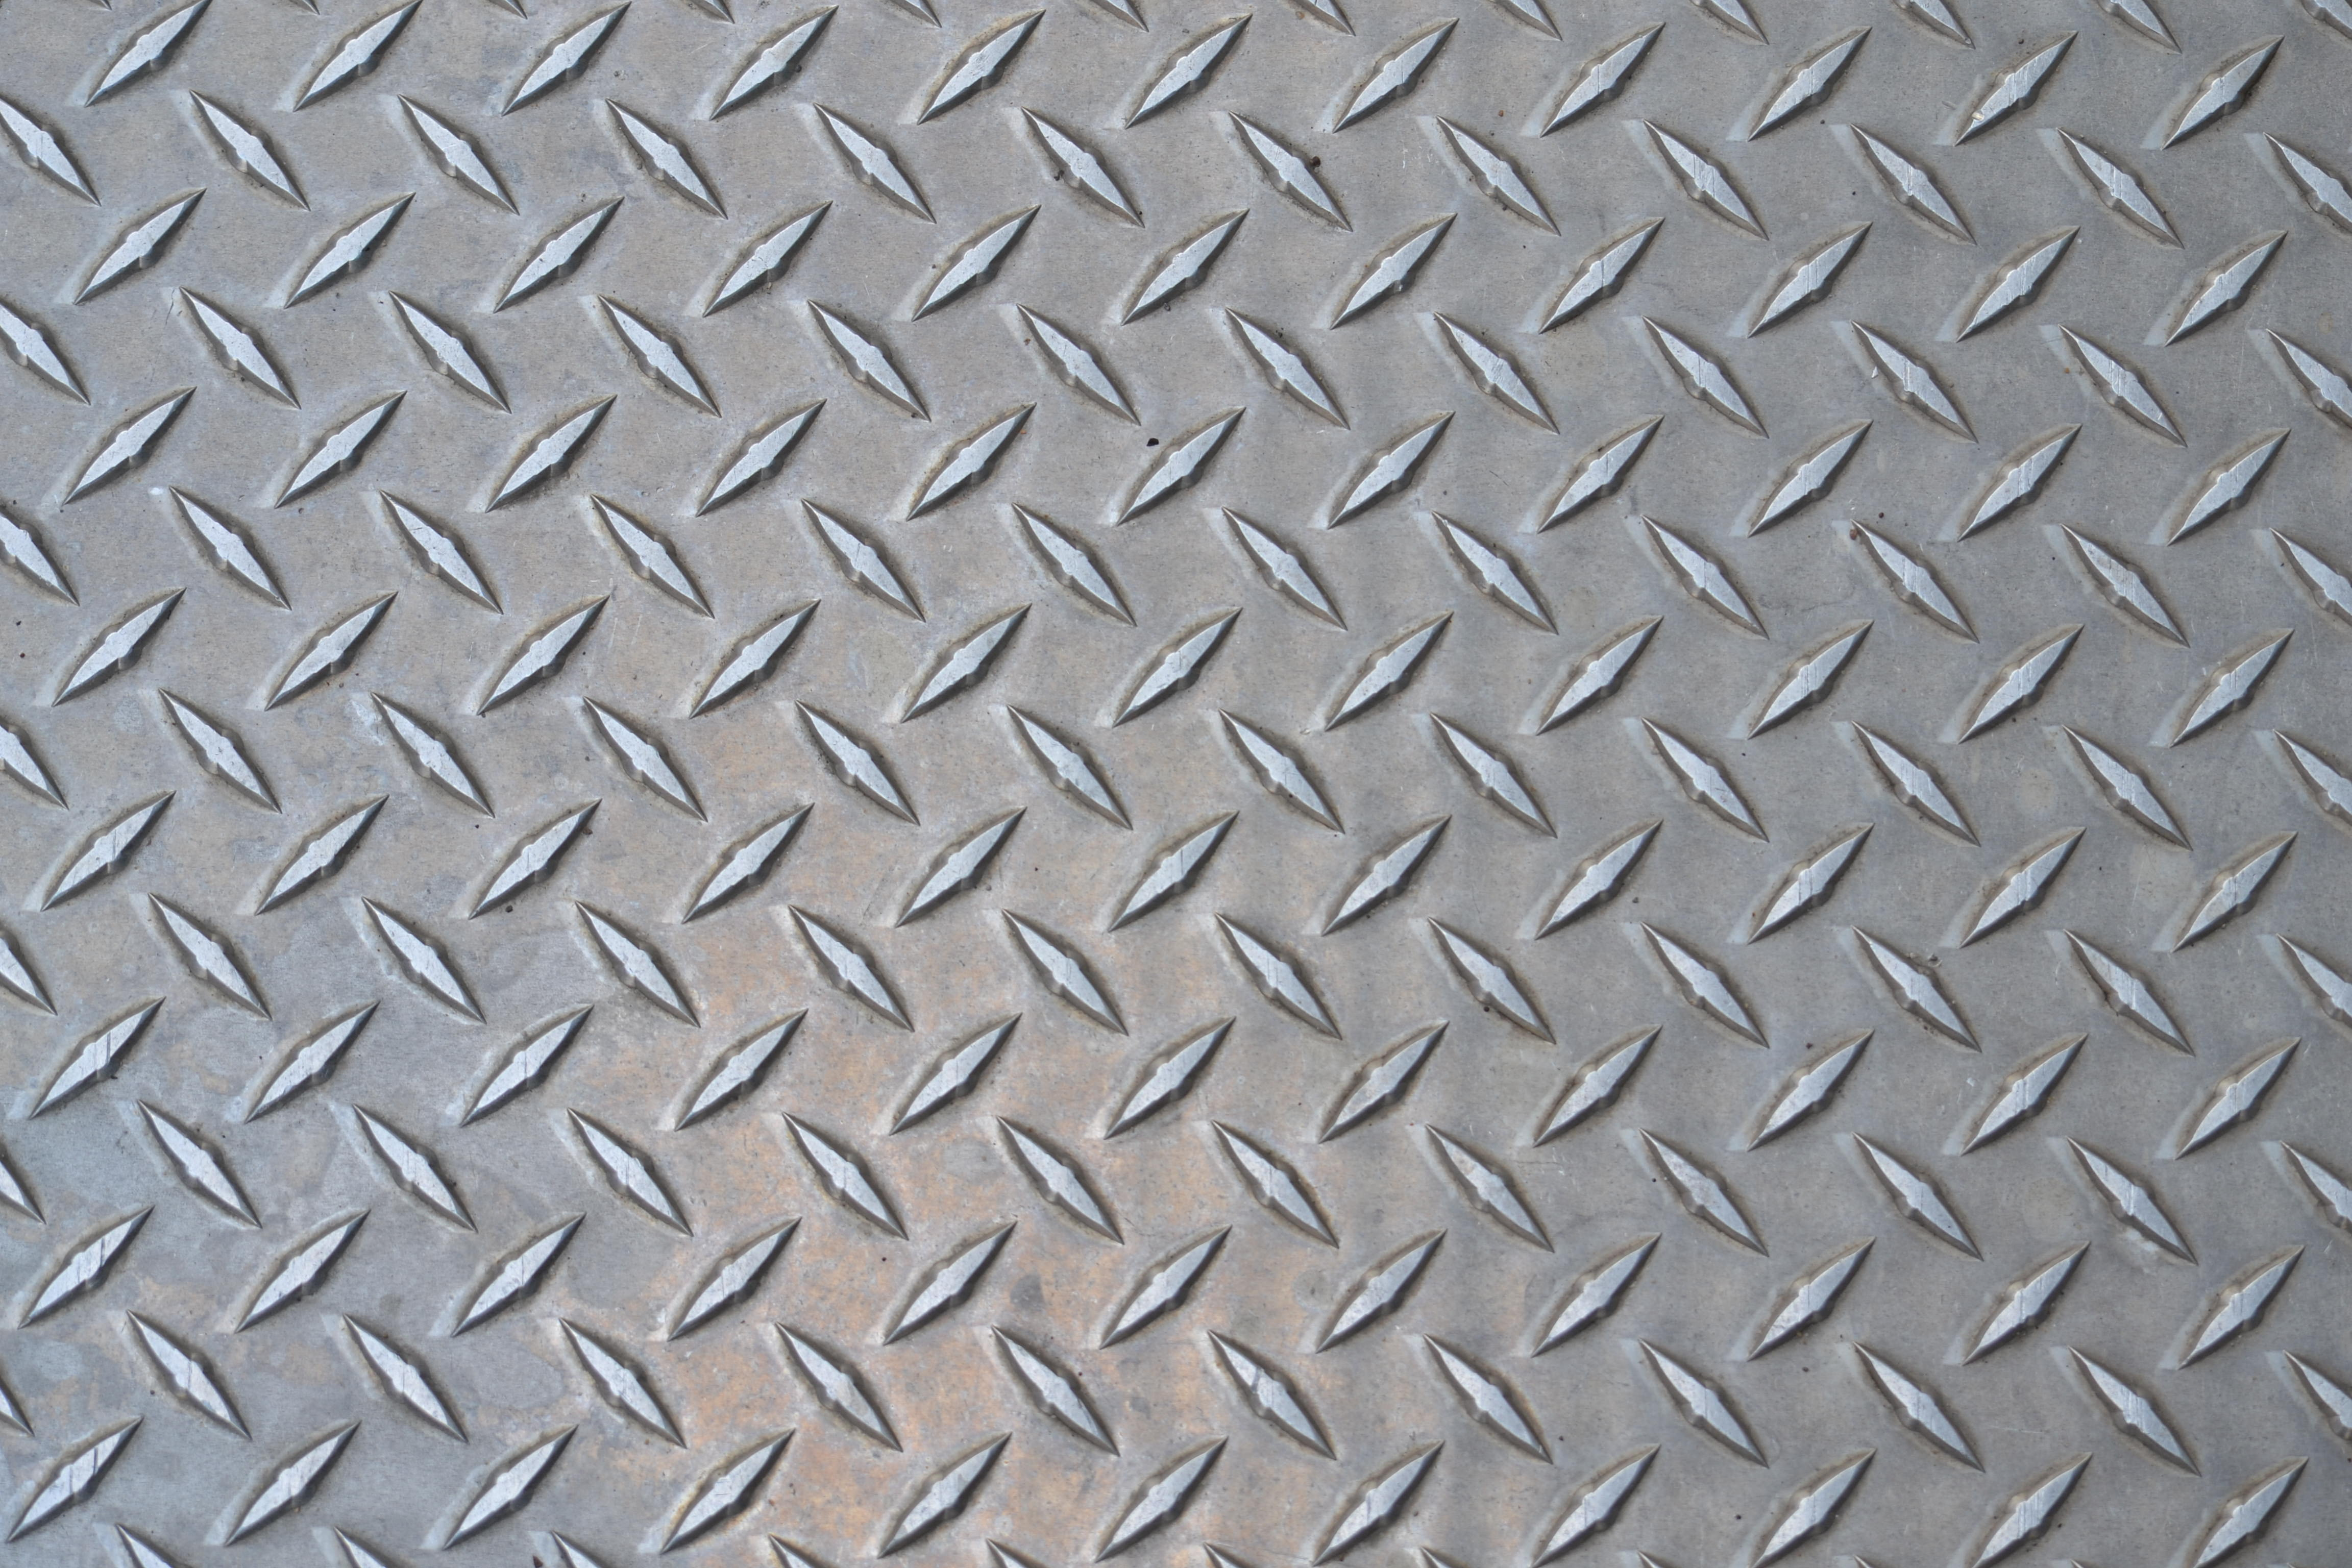 Black Diamond Plate Wallpaper 25 Diamond Plate Textures Patterns Backgrounds Design